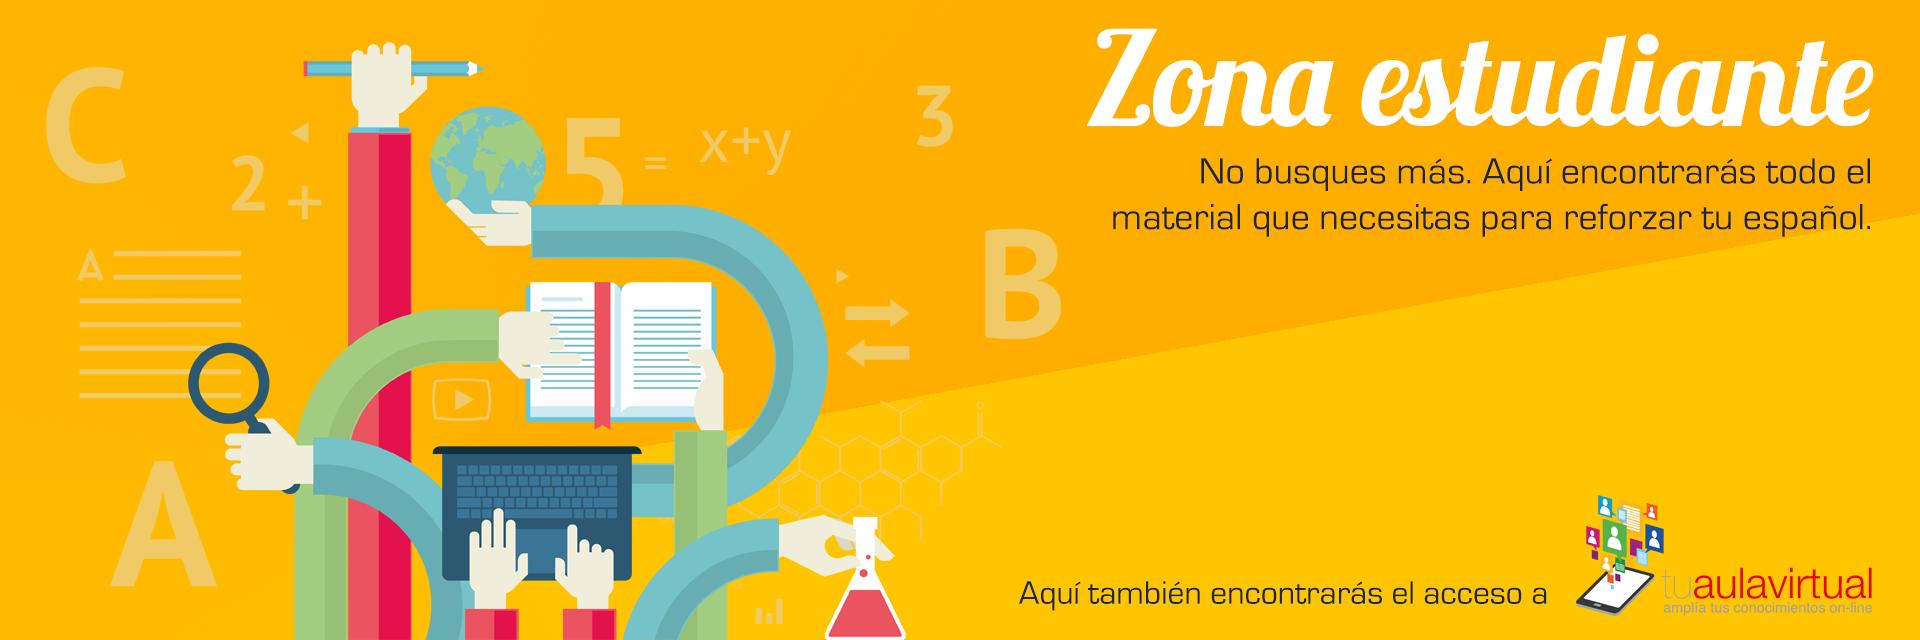 Zona estudiante Edelsa | Español lengua extranjera